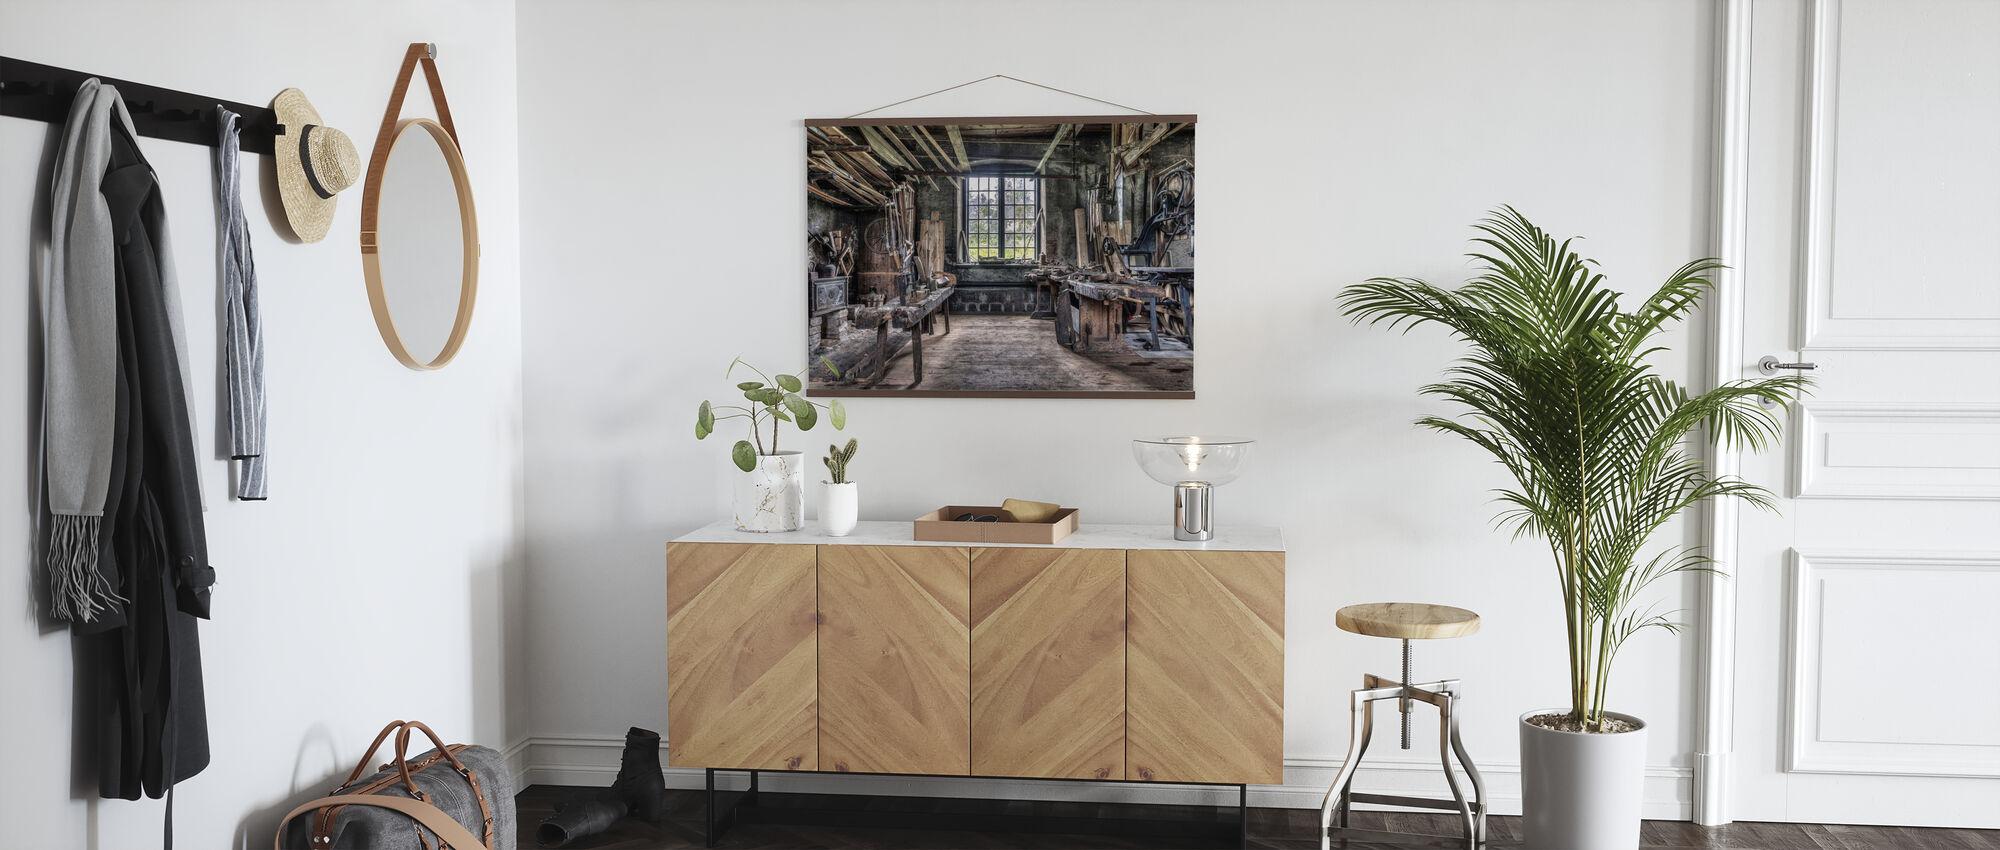 Carpenters Workshop - Poster - Hallway